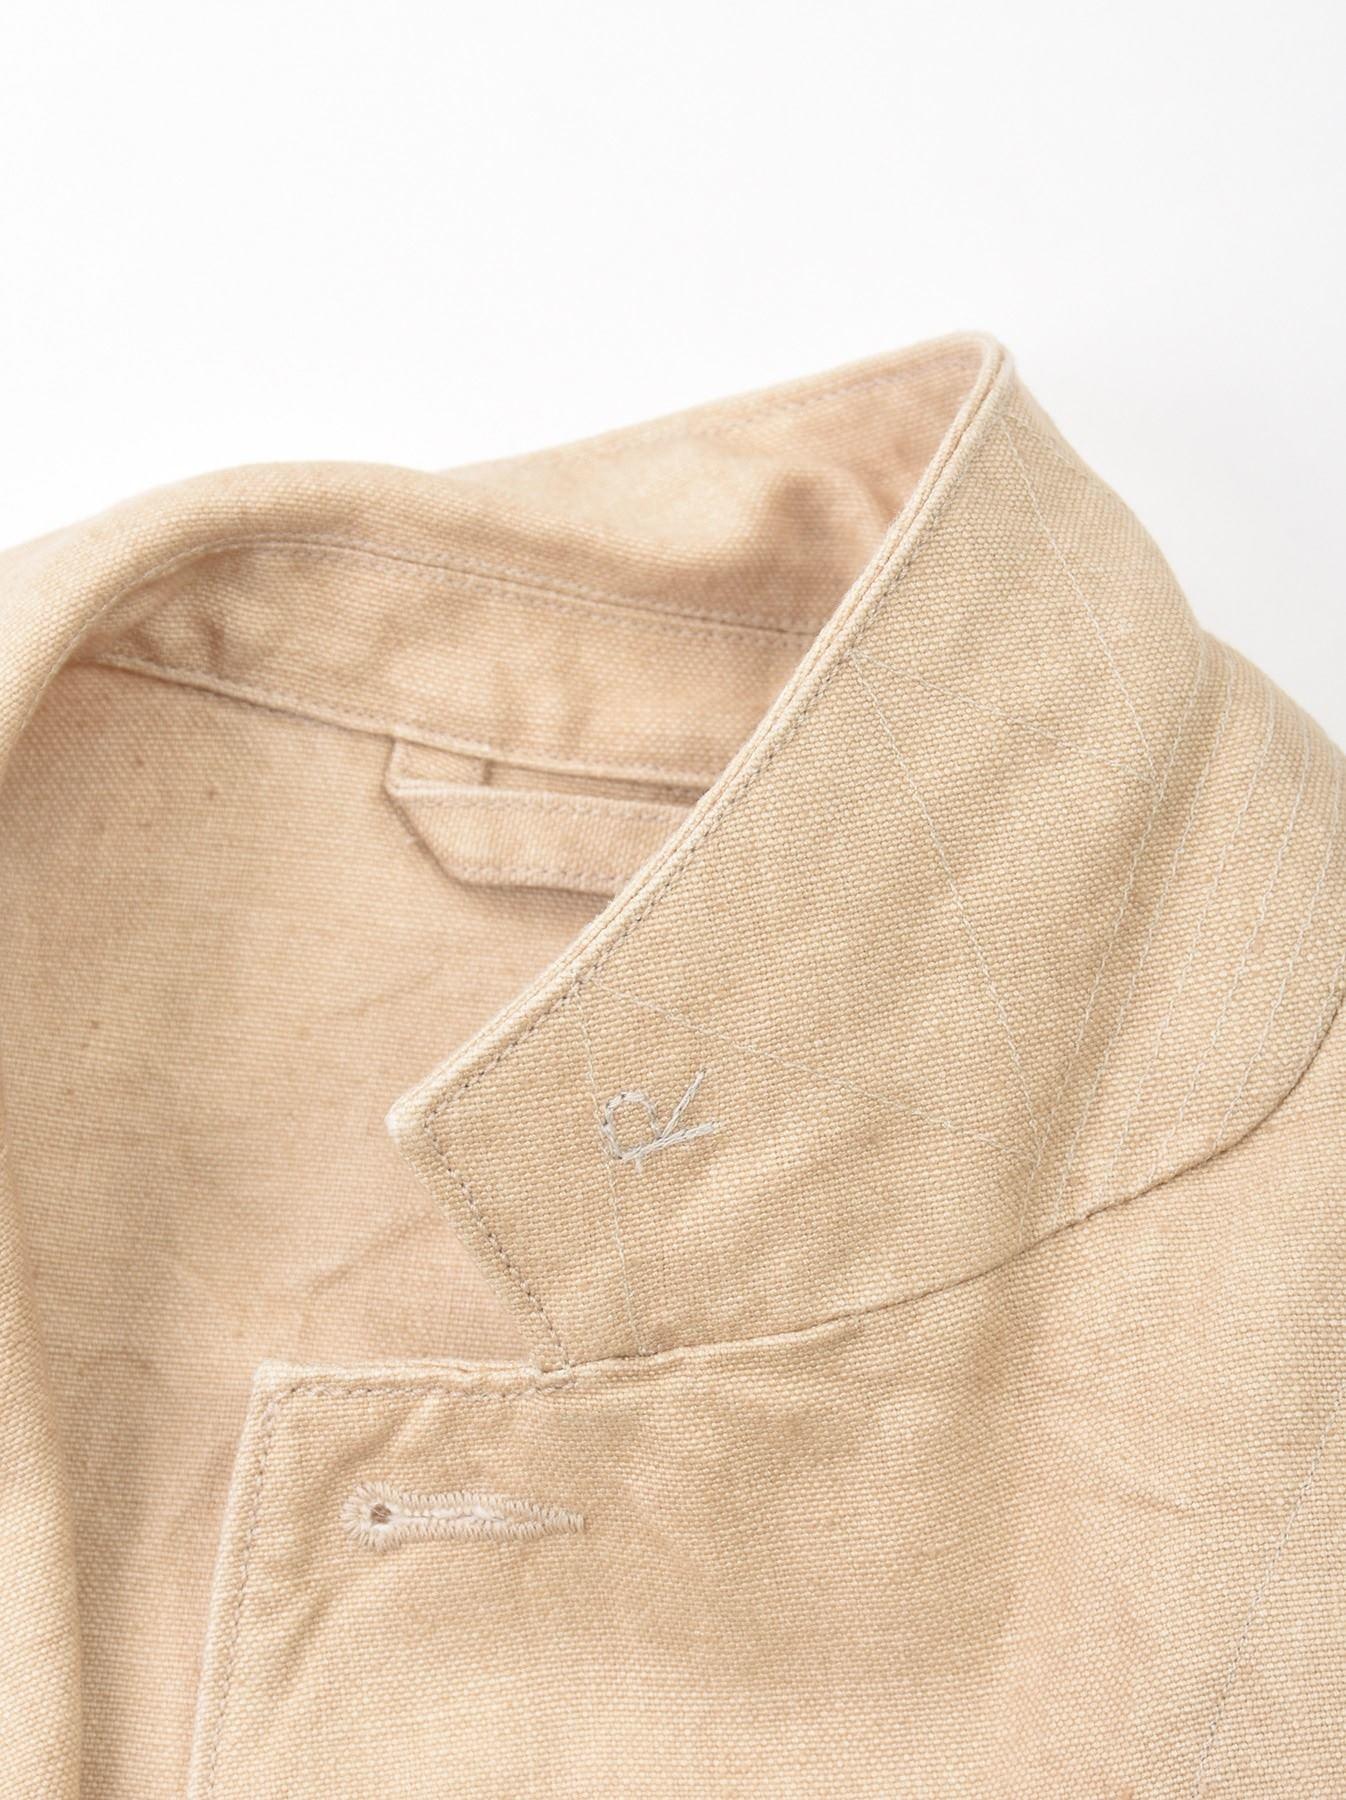 Linen Duck Asama Jacket-7